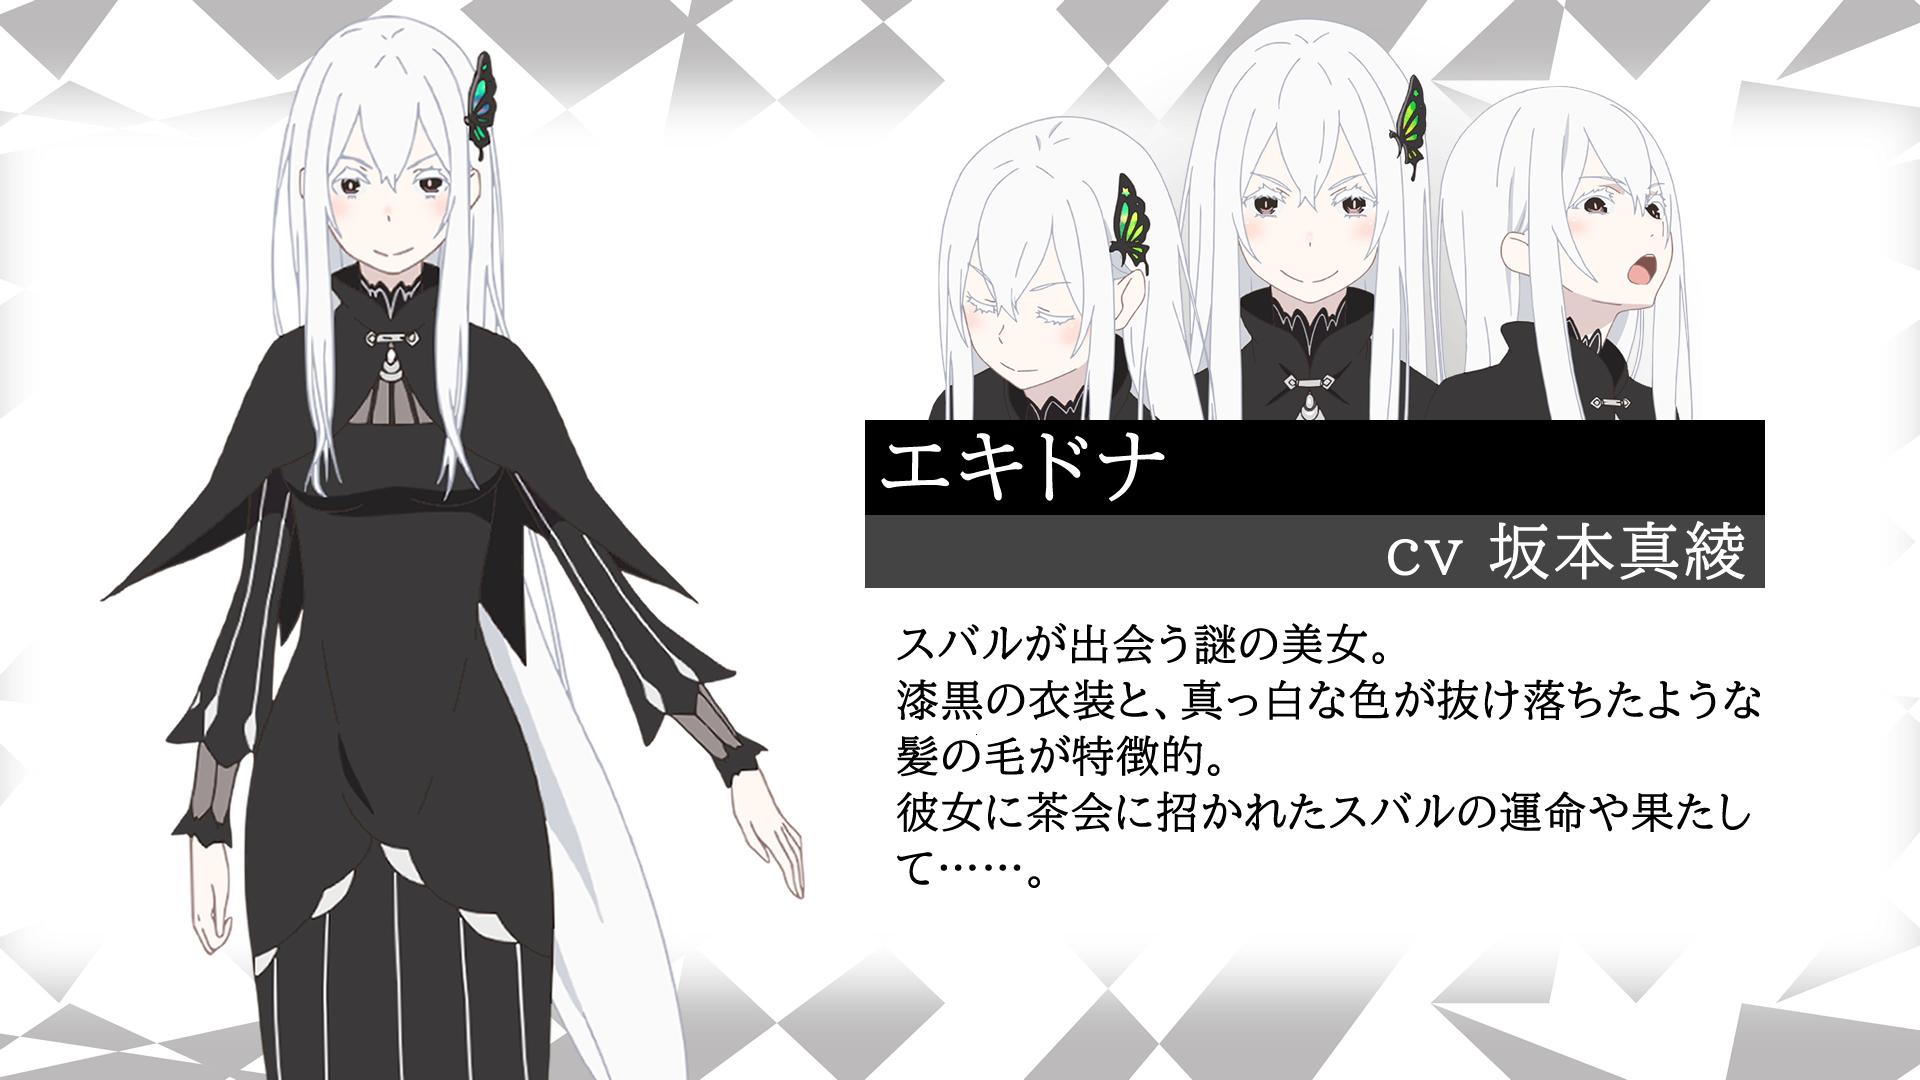 RE从零开始的异世界生活 第二季Rezero_official 1271061483837767680_p0